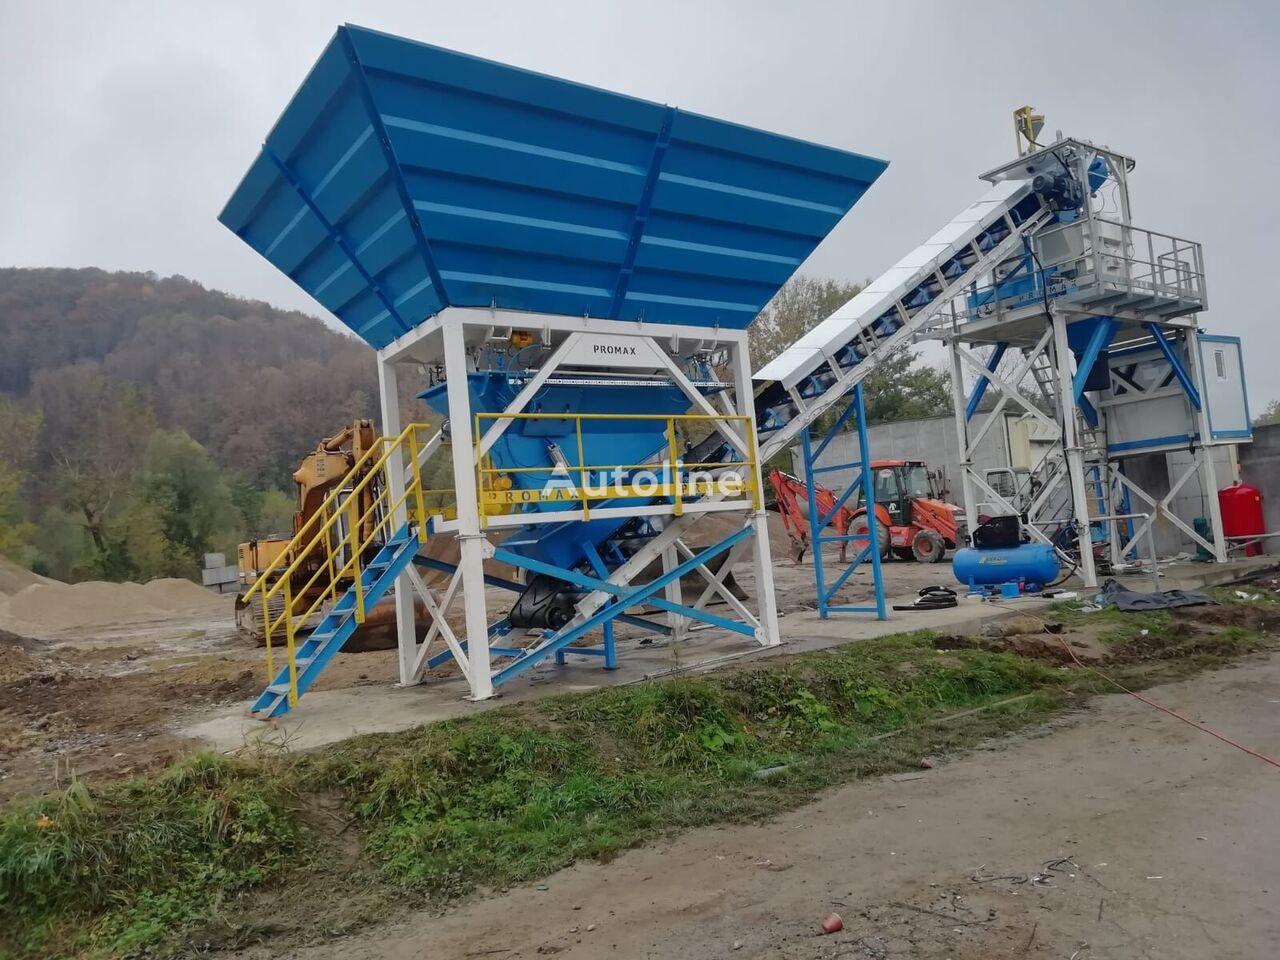 ny PROMAX Compact Concrete Batching Plant PROMAX C60 SNG PLUS(60m³/h) betongfabrikk